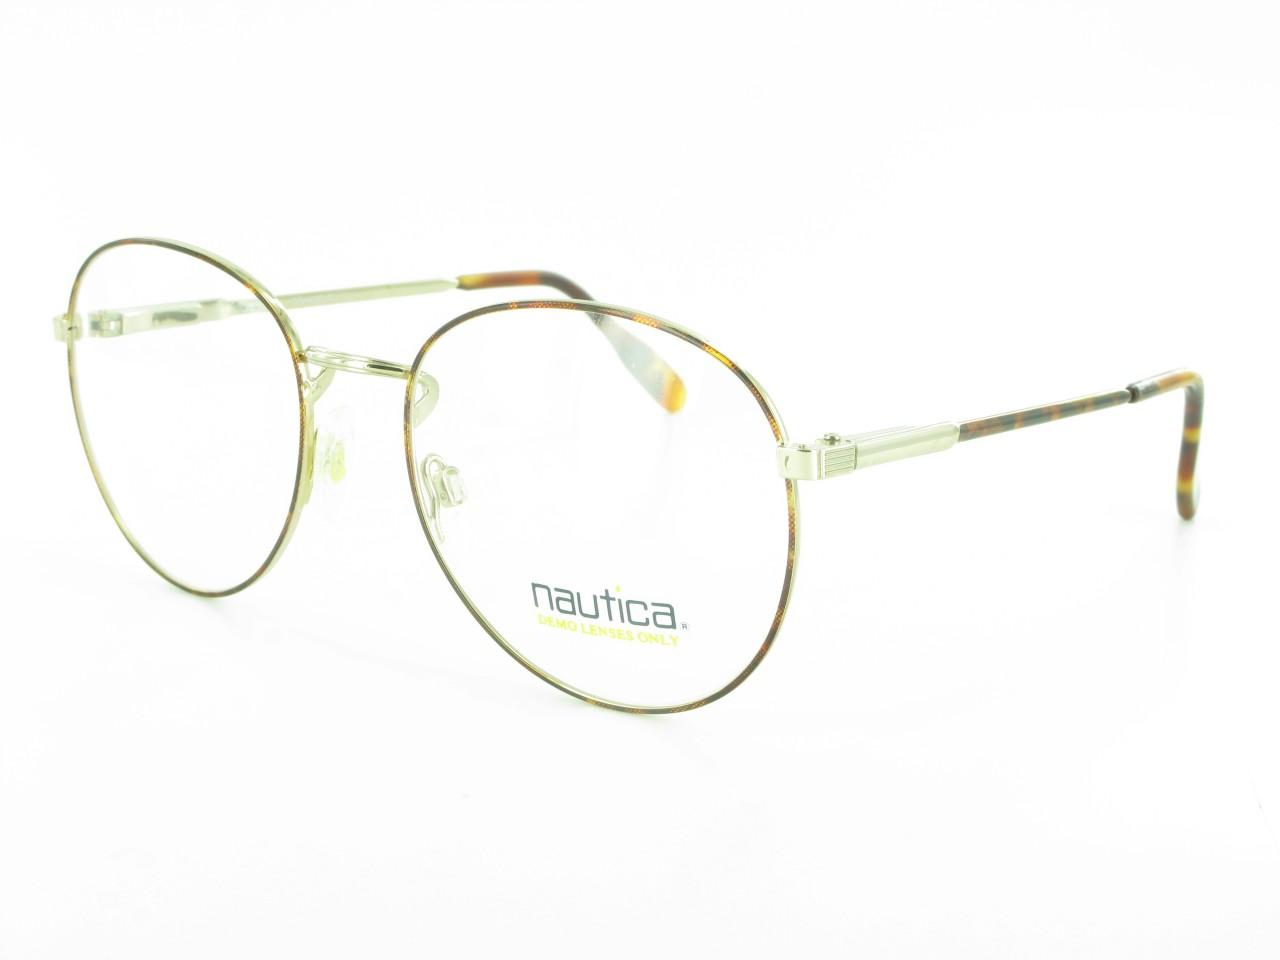 Large Designer Eyeglass Frames : Large Round NAUTICA J6 EYEGLASSES Mens or Womens Designer ...